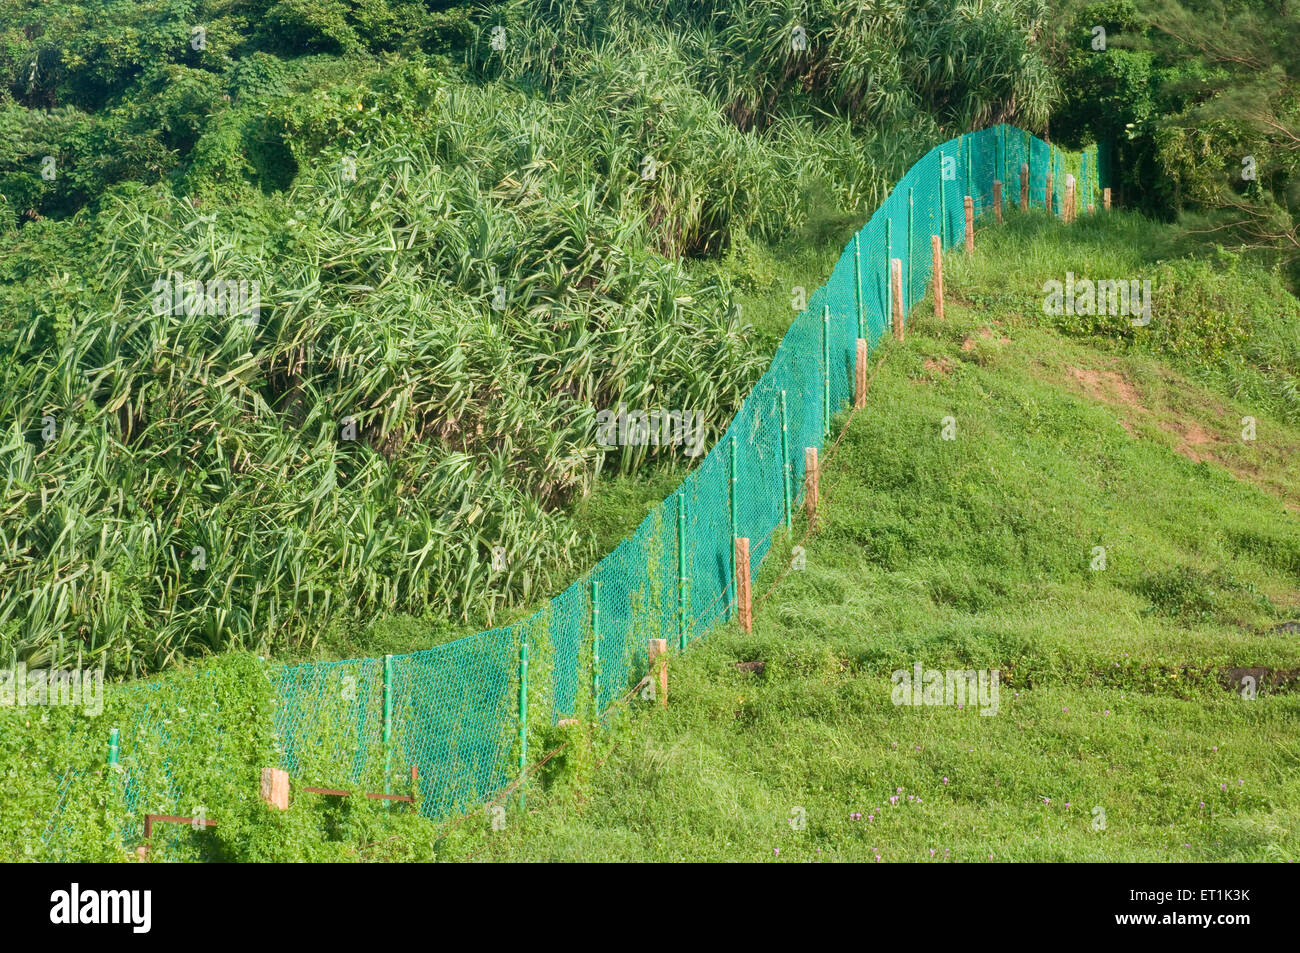 Foliage and green mesh divider Anjuna Beach Goa Maharashtra India Asia Sept 2010 - Stock Image